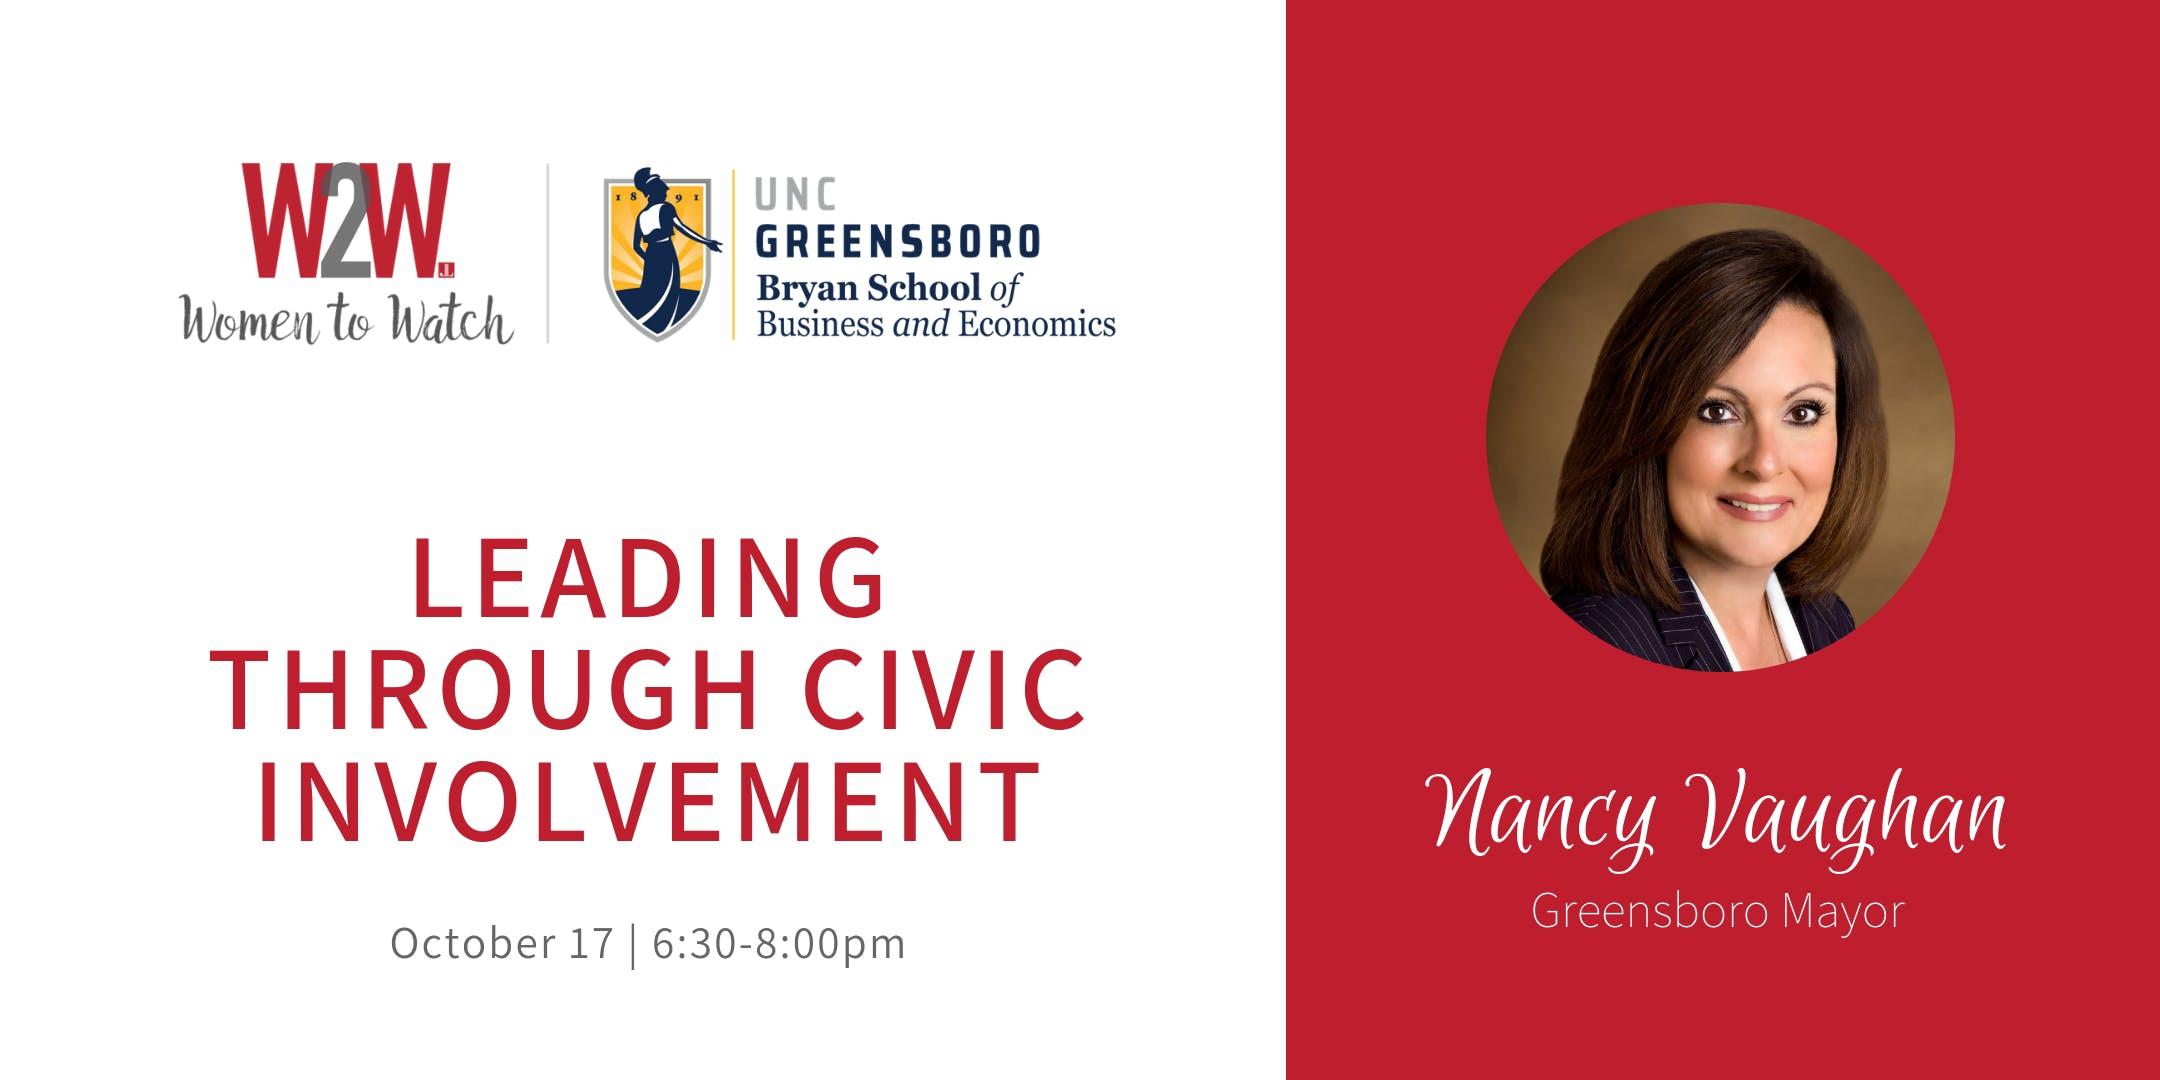 Women-to-Watch: Greensboro Mayor Nancy Vaugha